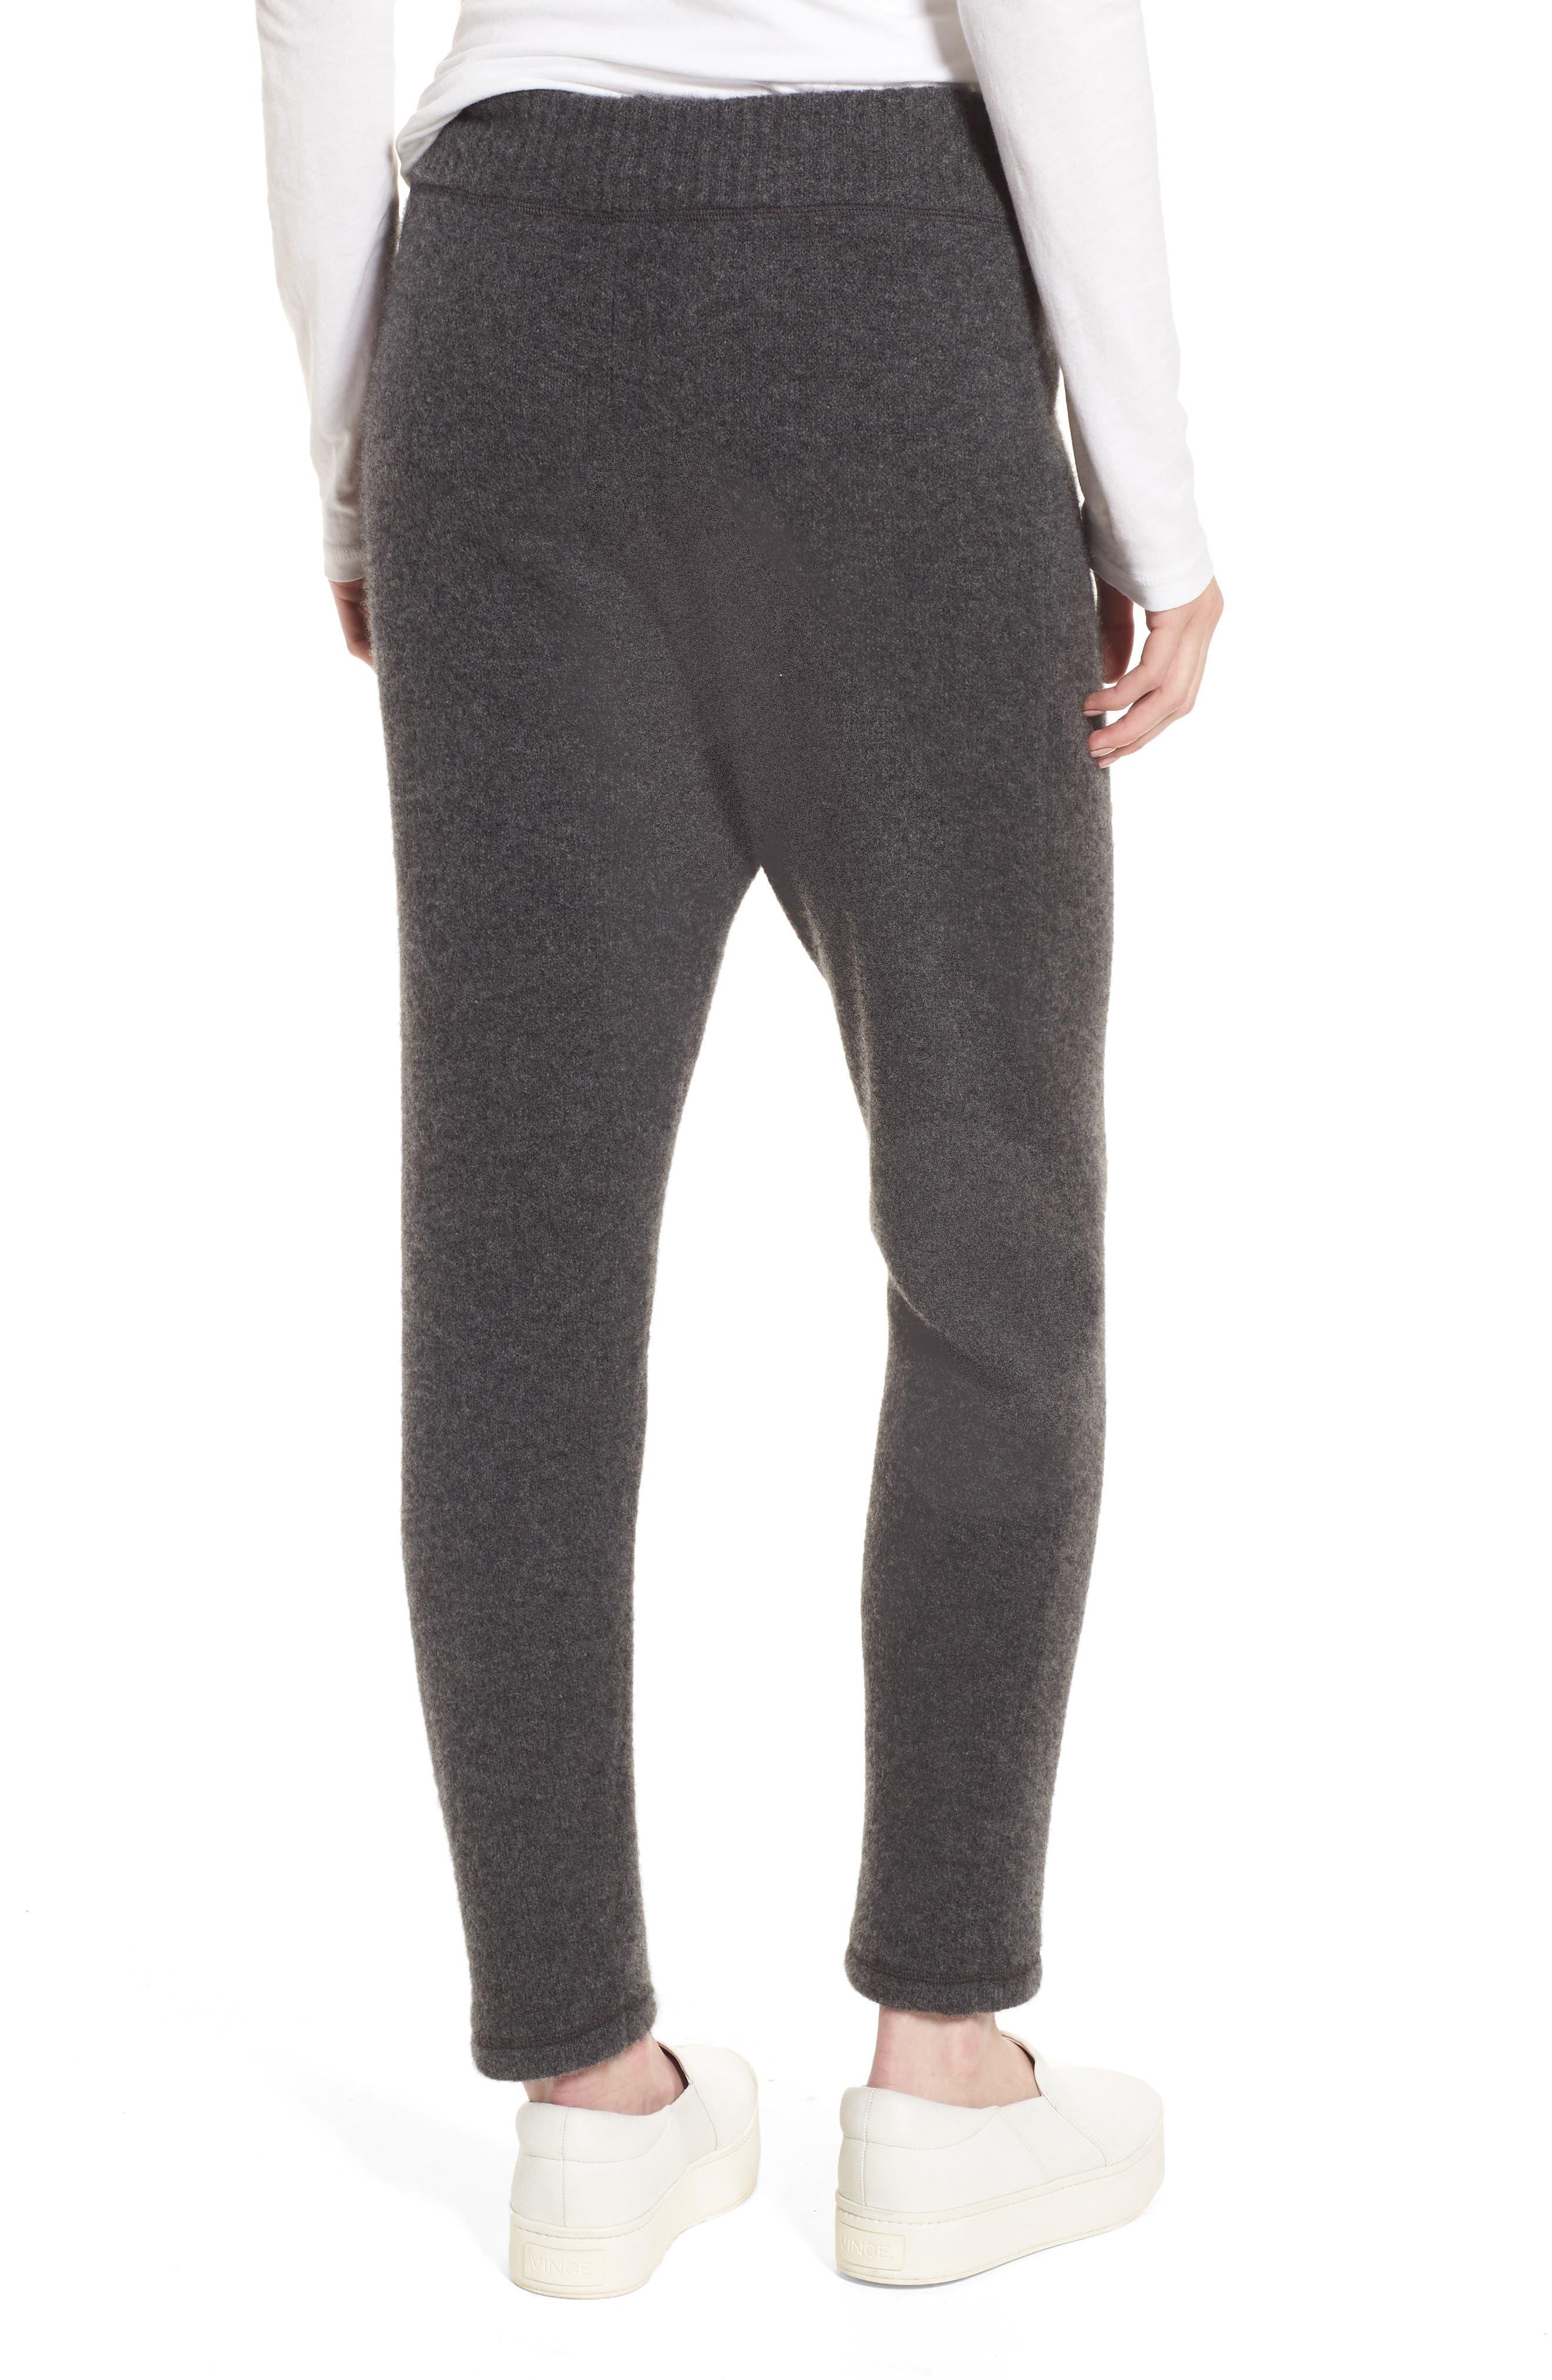 Brushed Cashmere Sweatpants,                             Alternate thumbnail 2, color,                             Charcoal